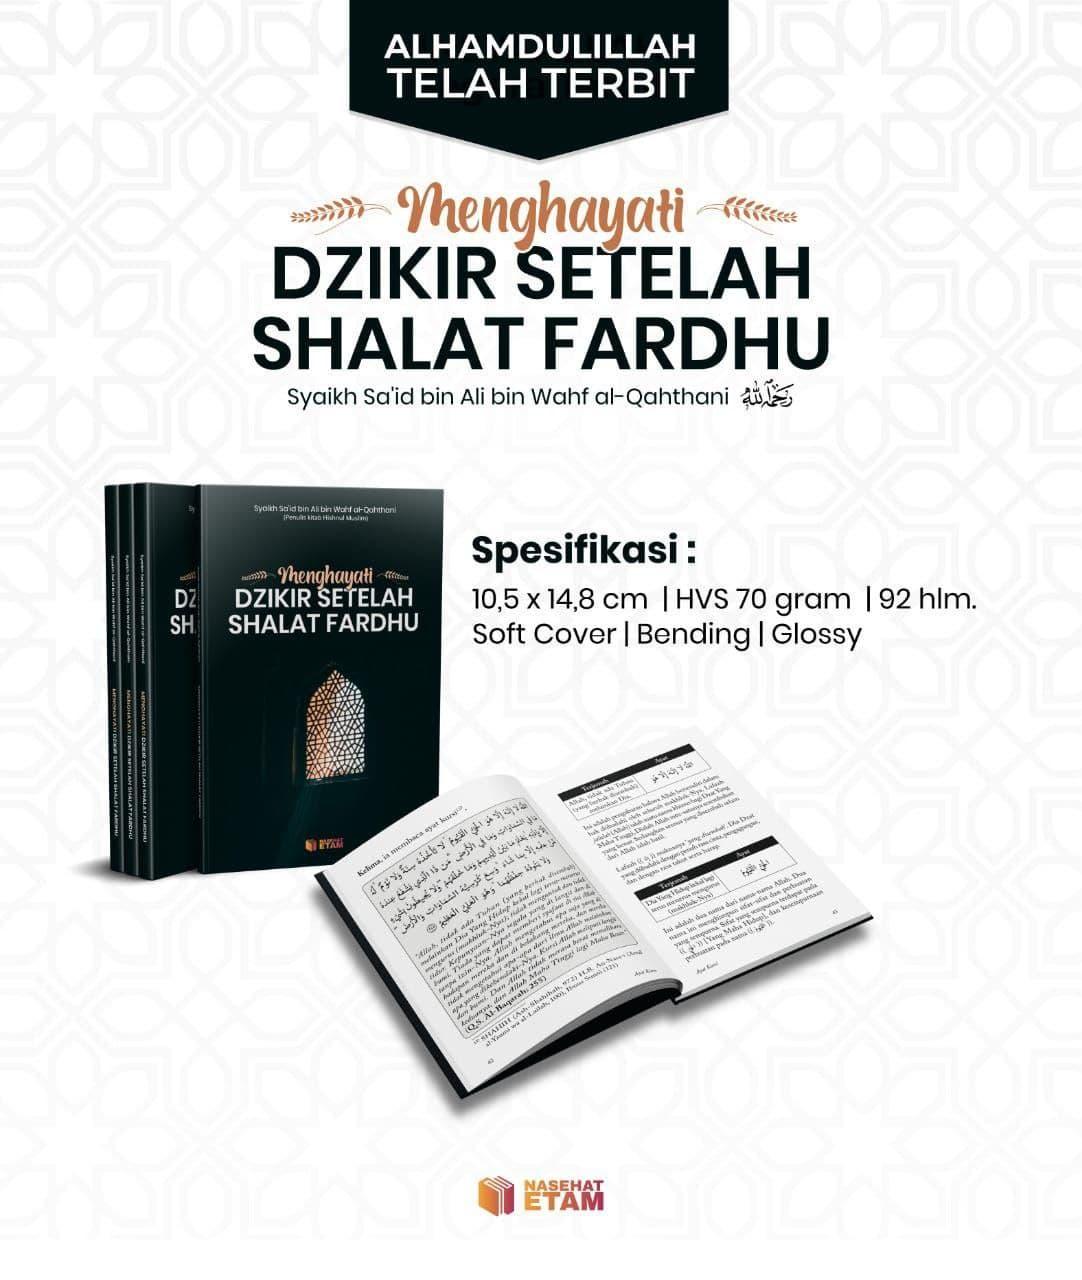 Buku Menghayati Dzikir Setelah Shalat Fardhu Nasehat Etam